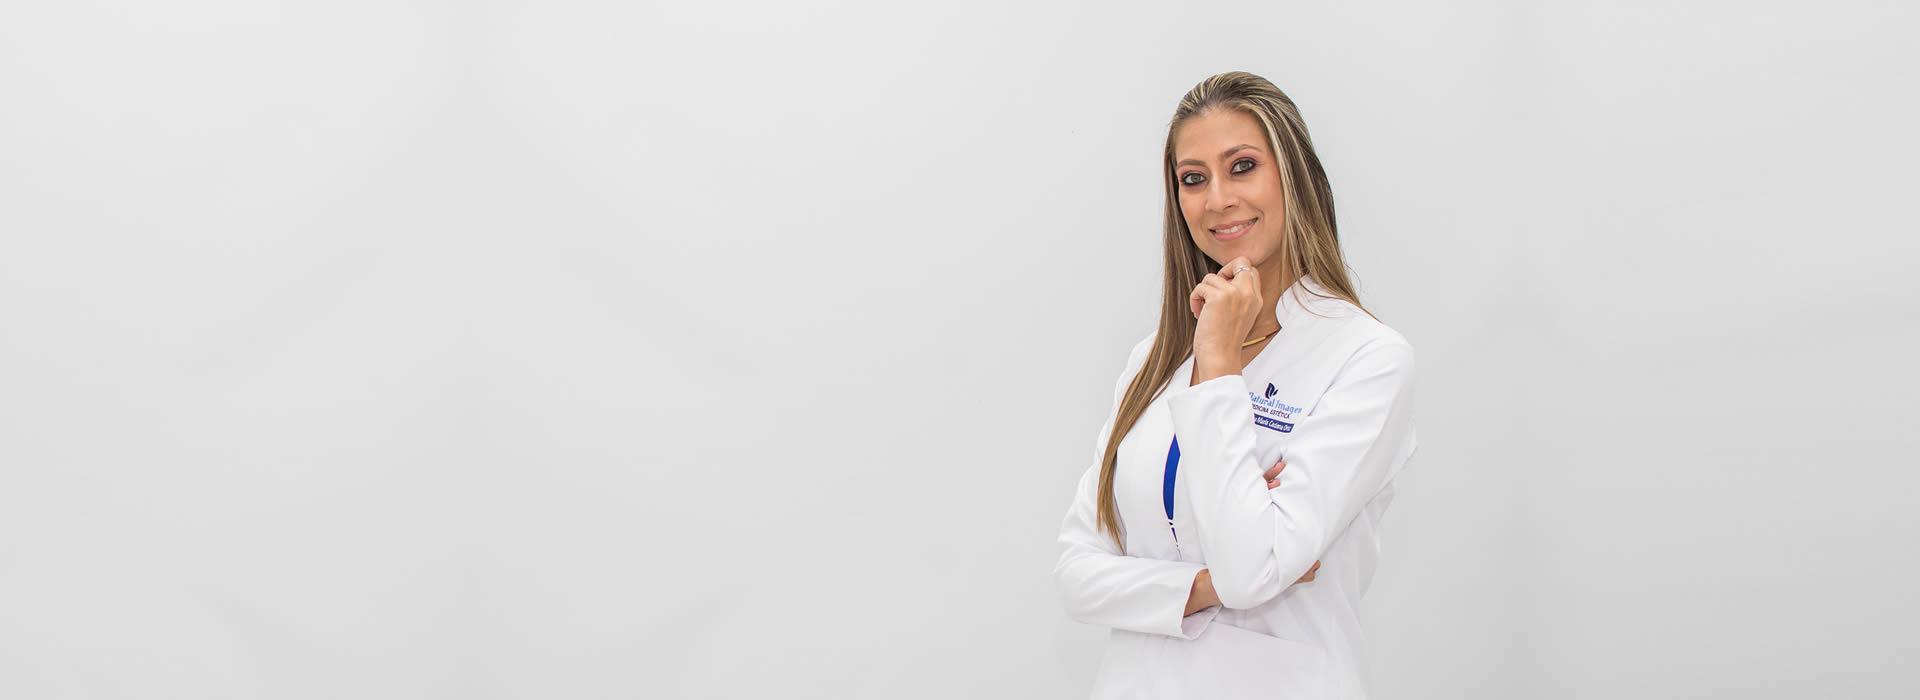 Dra. Lina Maria Cadena - Bucaramanga